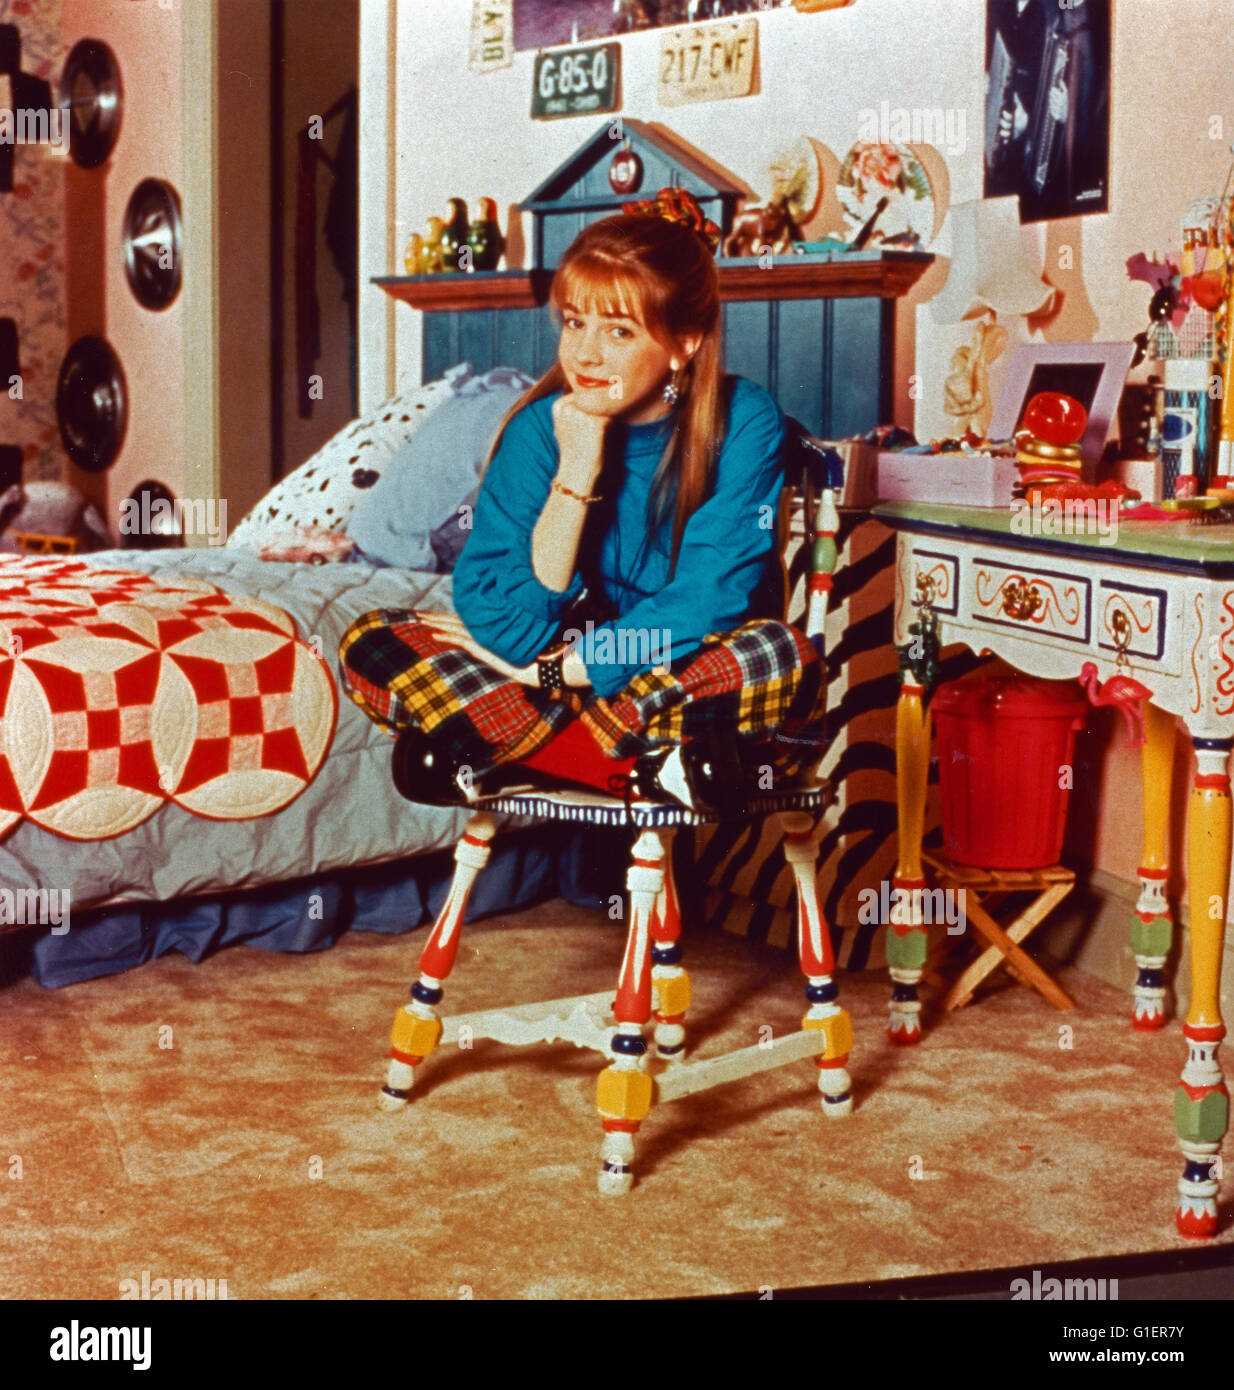 Clarissa explica tudo, aka: Clarissa, Teenagerserie; EUA 1991 - 1994, Darsteller: Melissa Joan Hart Imagens de Stock